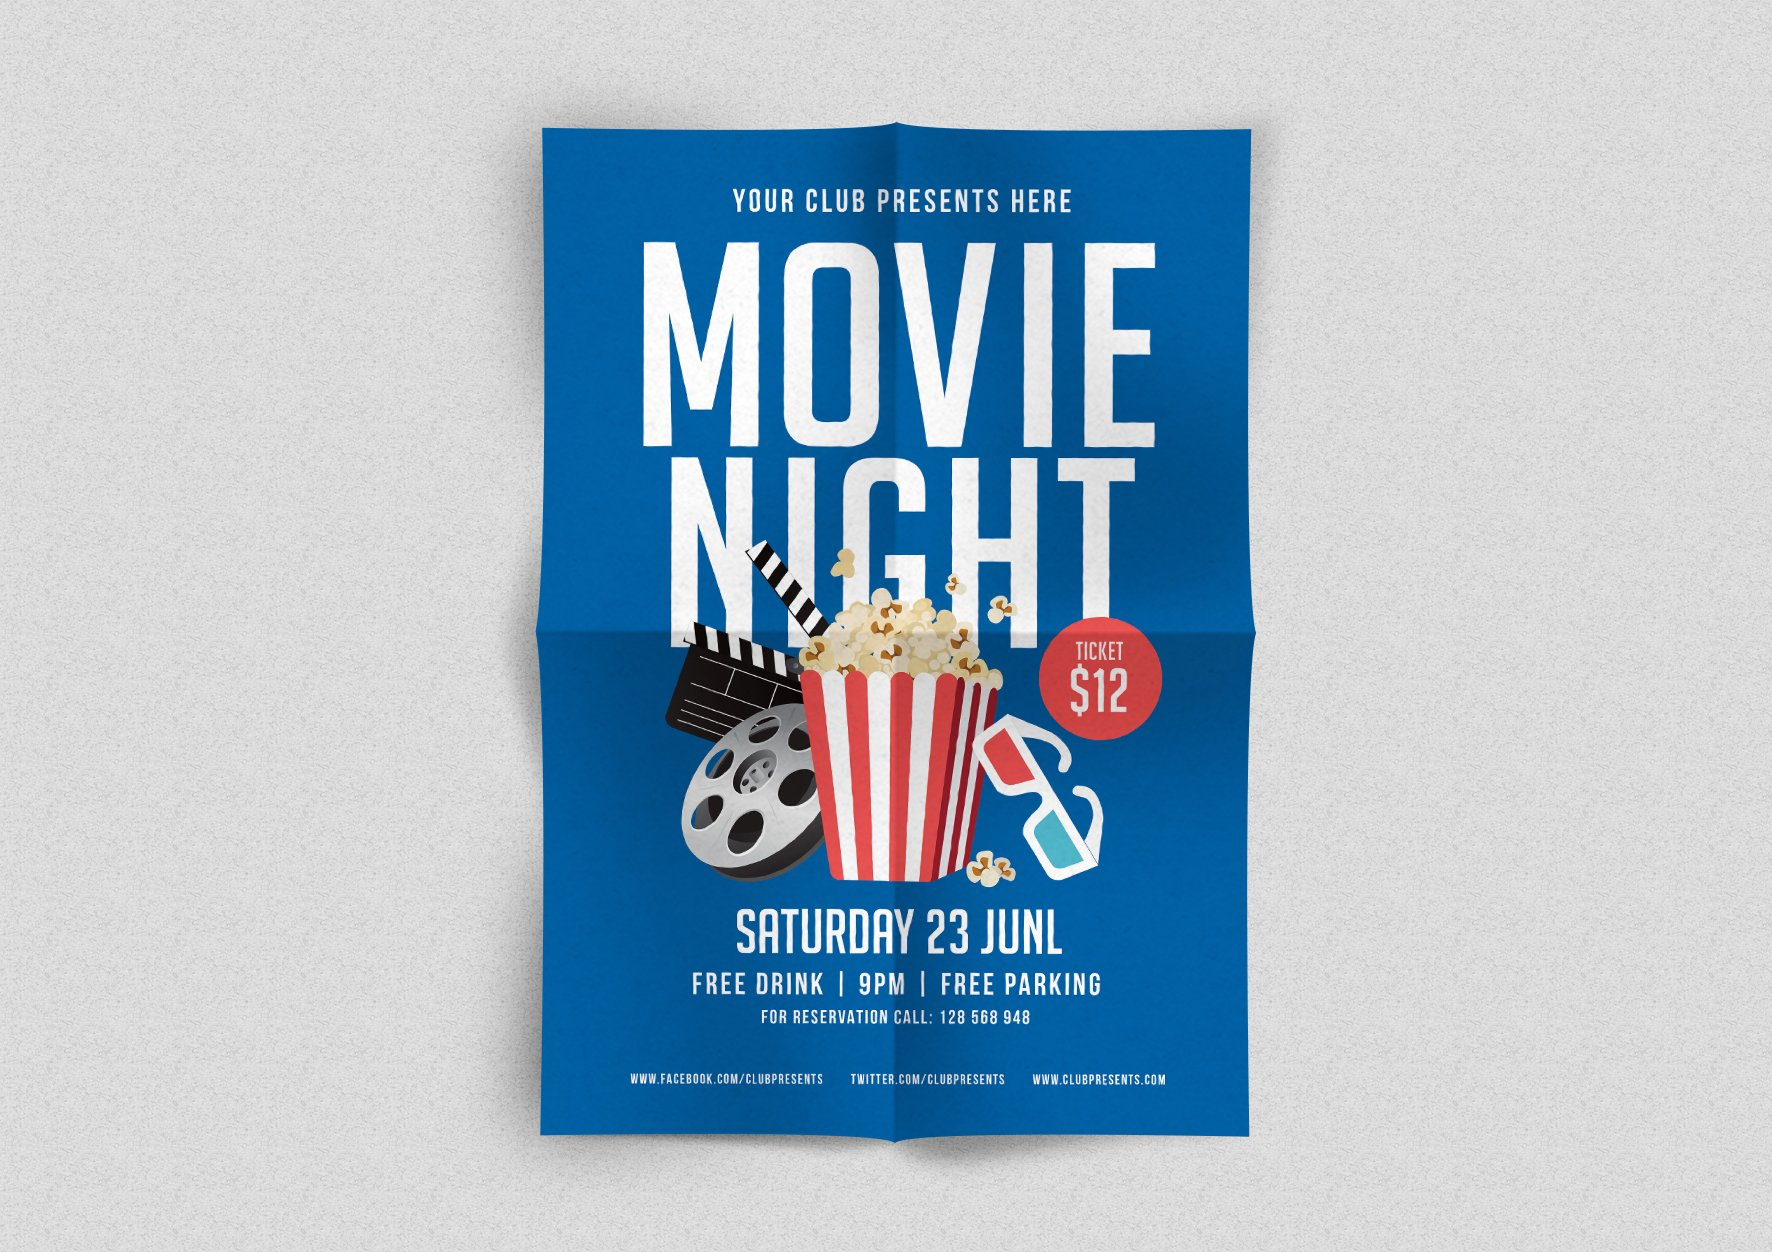 movie night flyer flyer templates creative market. Black Bedroom Furniture Sets. Home Design Ideas